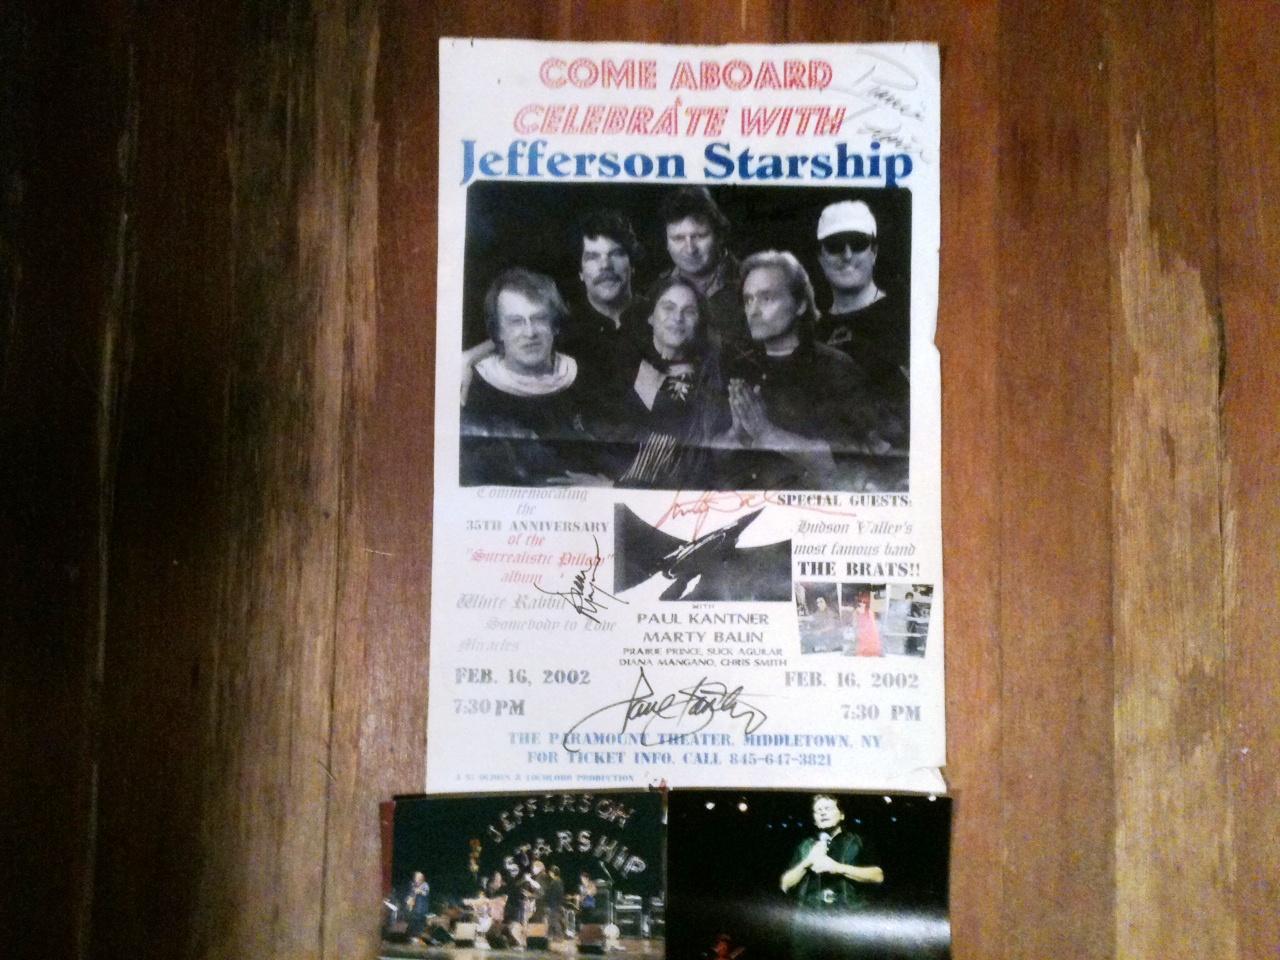 Jefferson Starship Private Room